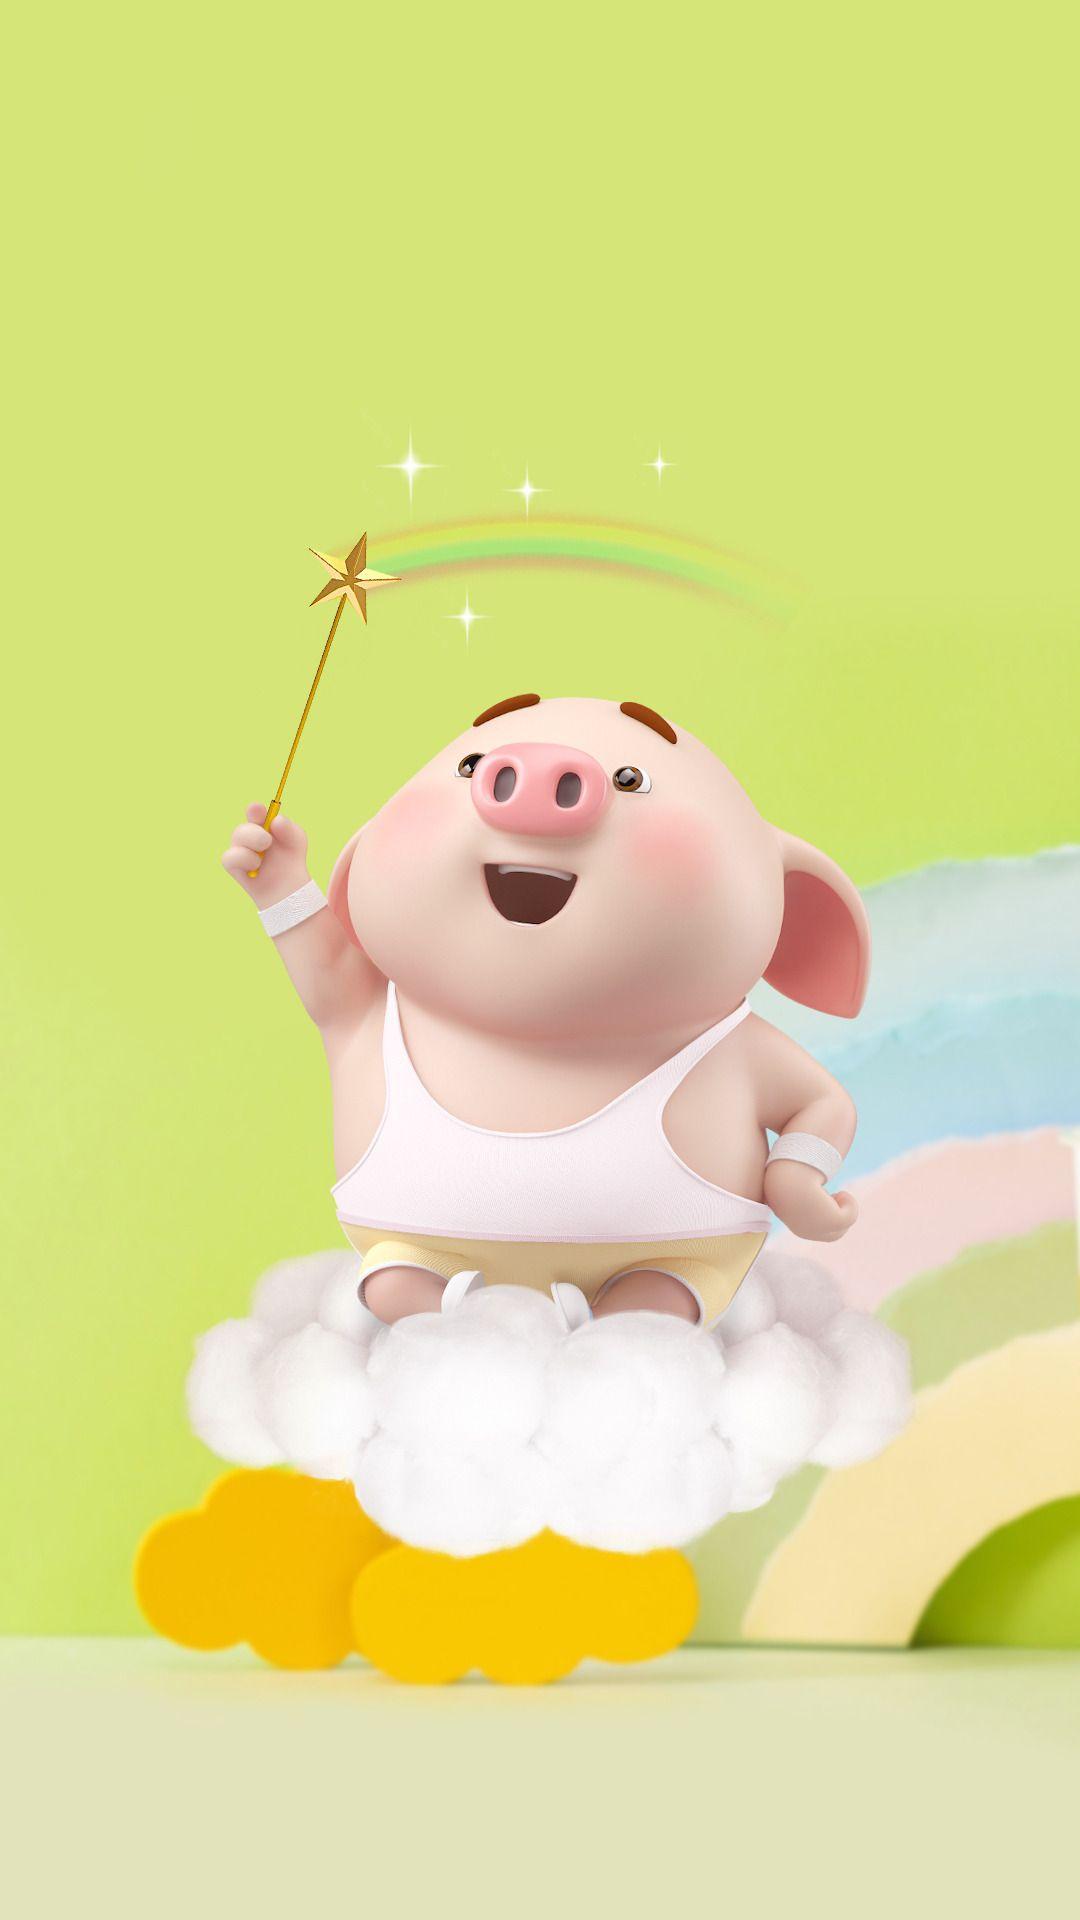 Lovely Pig ล กหม คาวาอ วอลเปเปอร